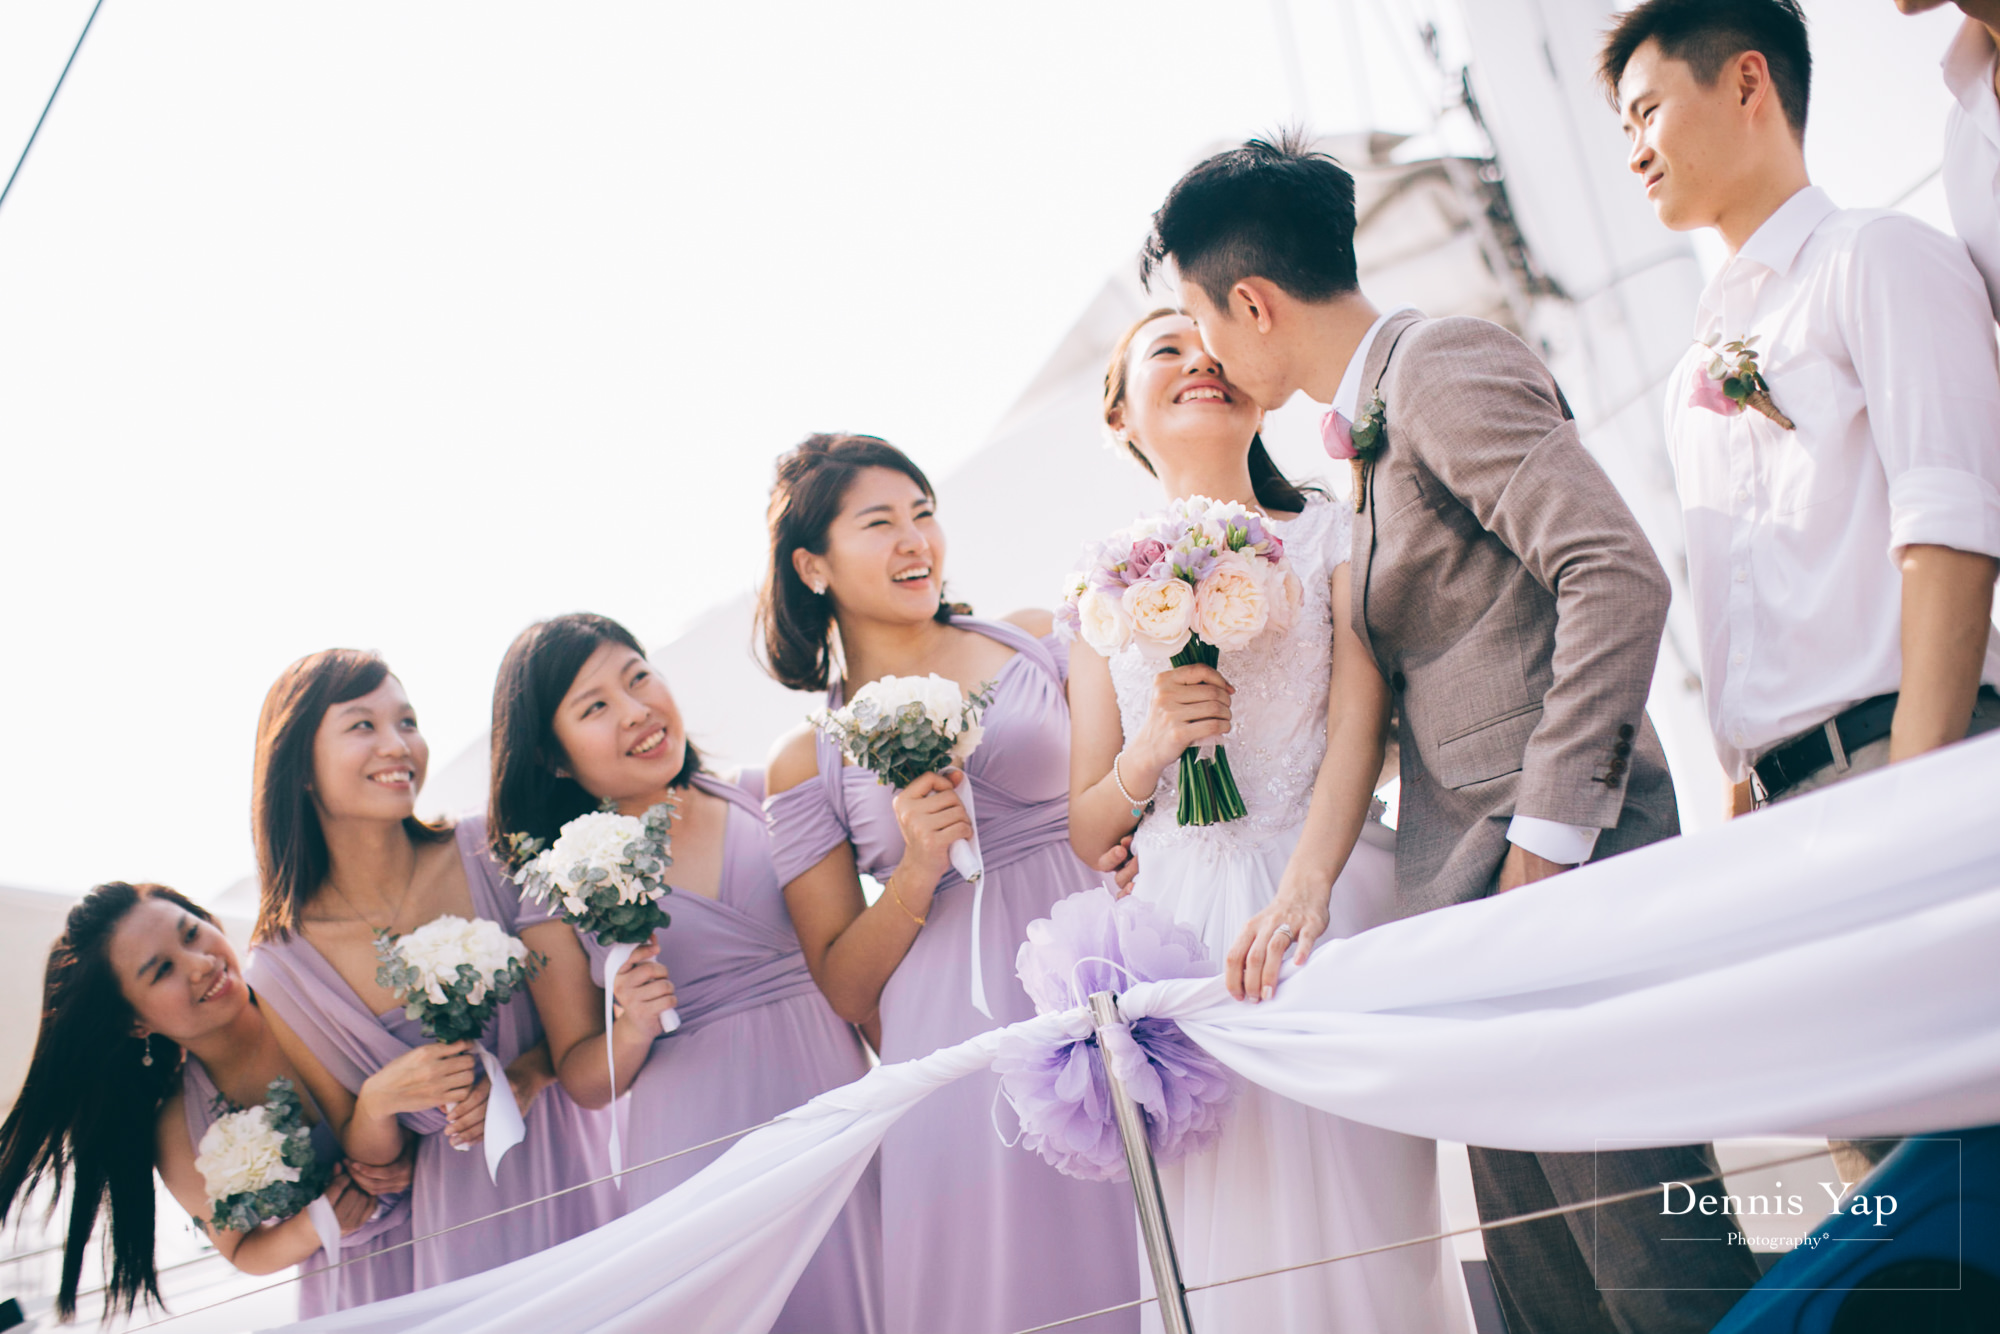 danny sherine wedding reception registration of marriage yacht fun beloved sea dennis yap photography malaysia top wedding photographer-24.jpg